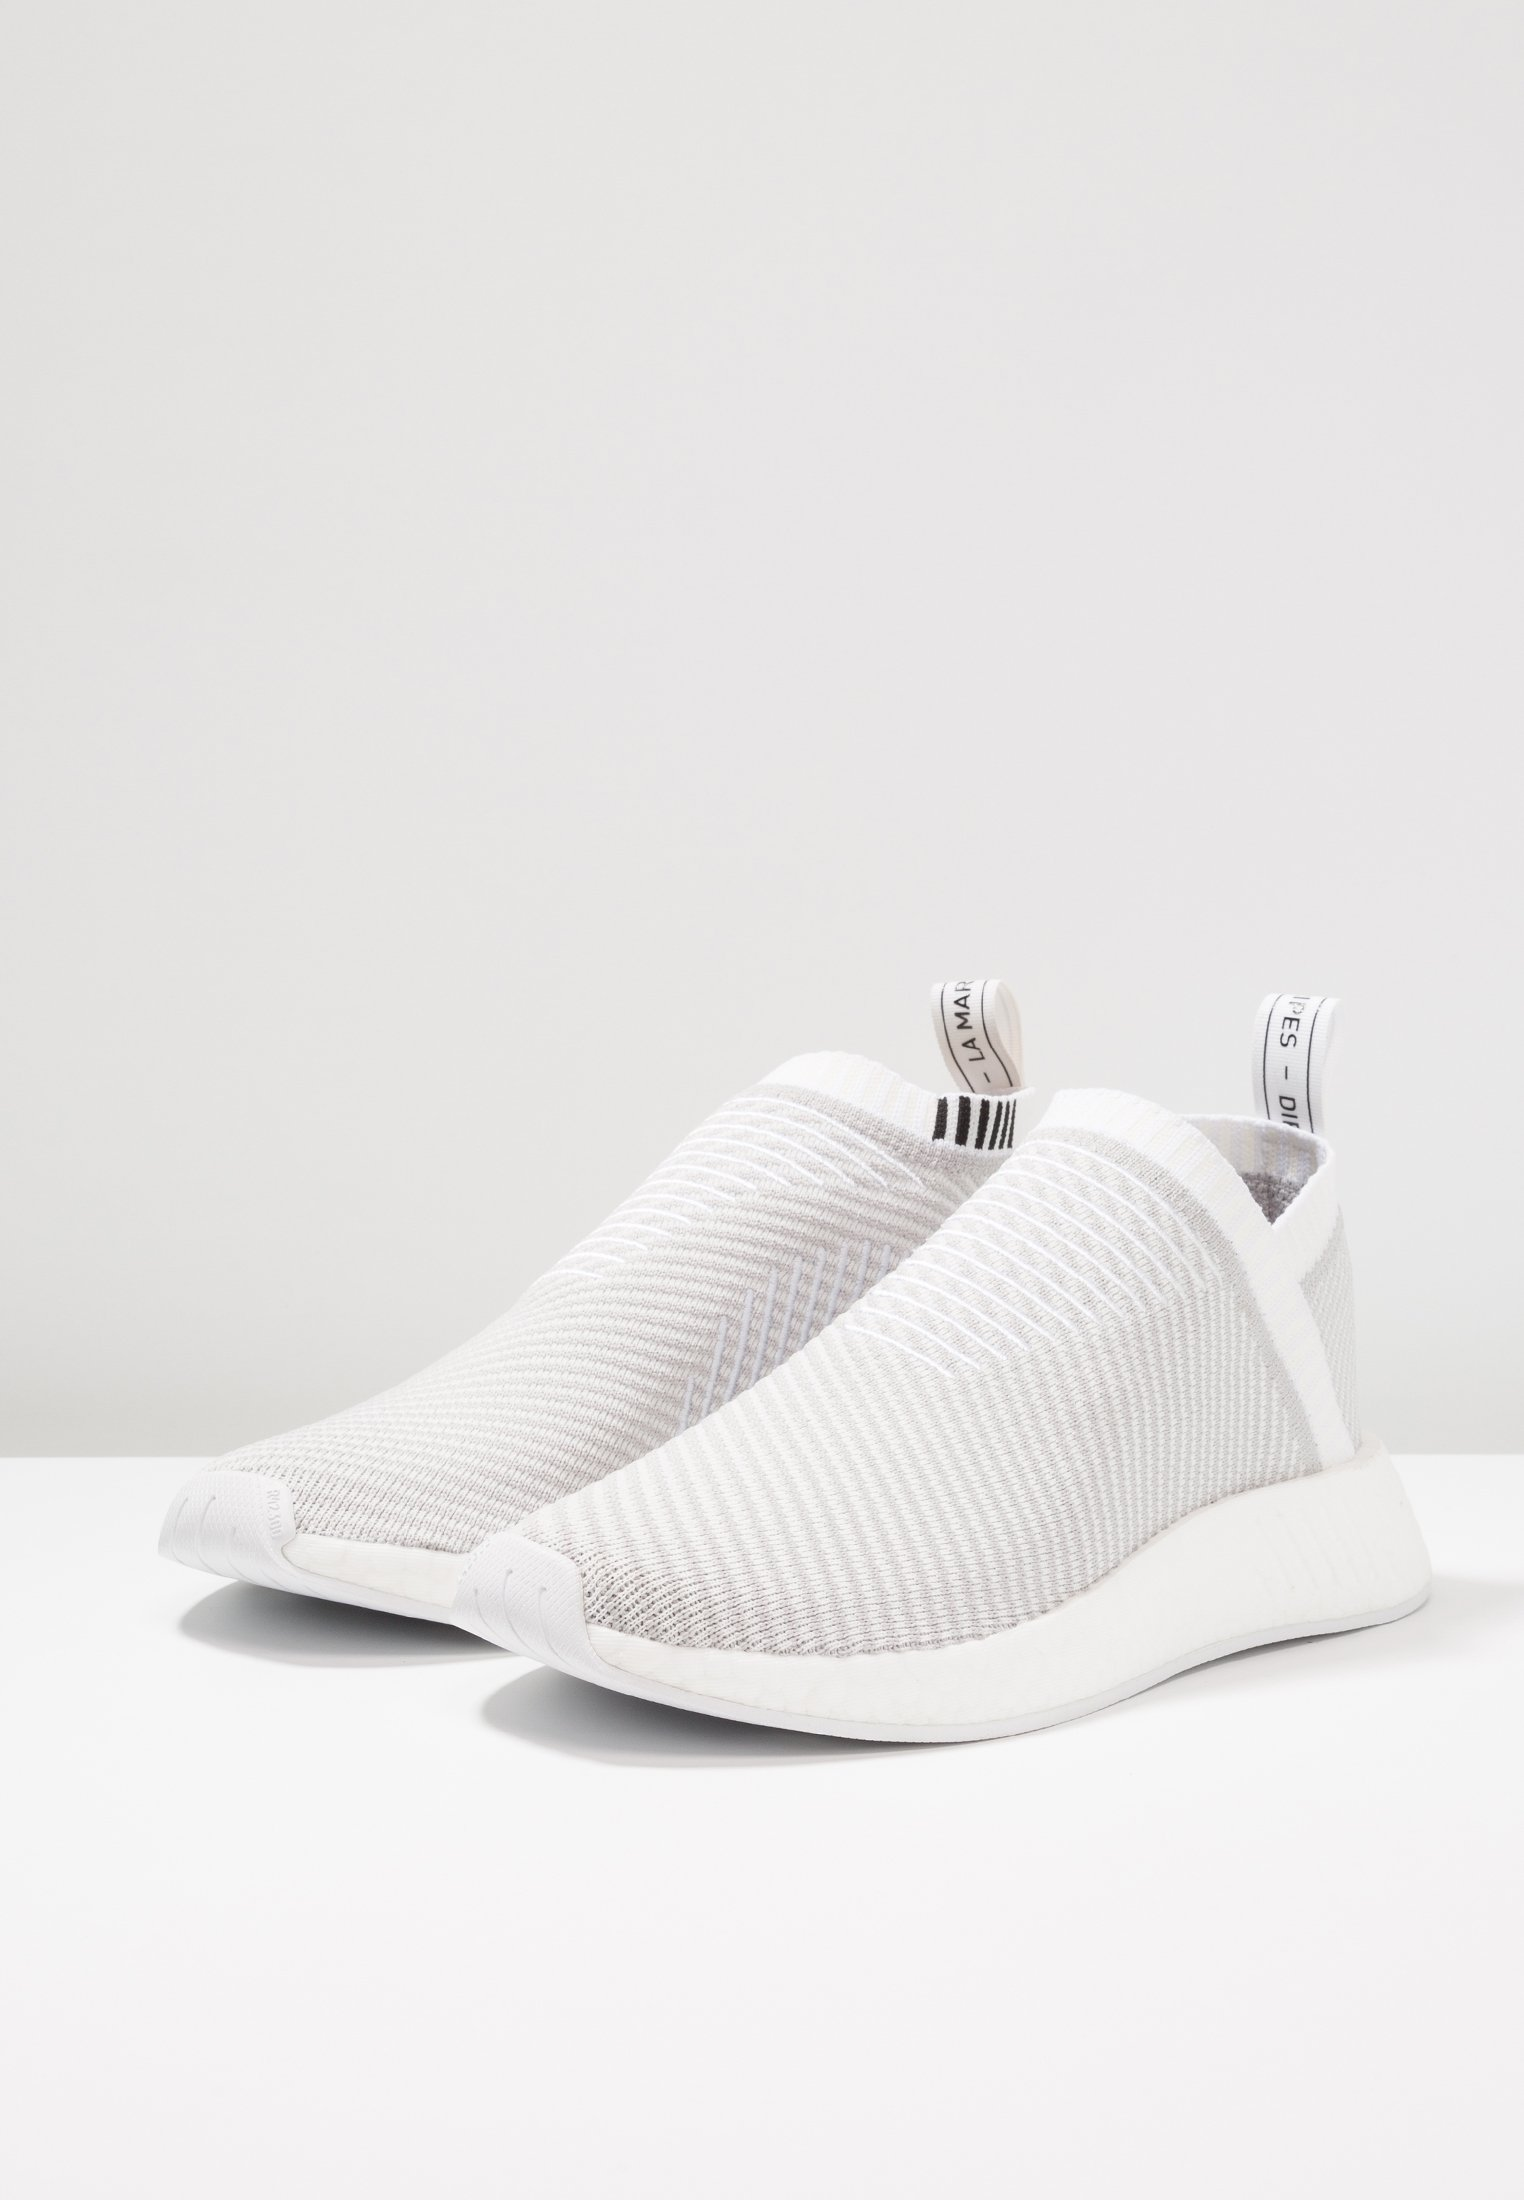 Black core Adidas Basses Nmd Originals Cs2Baskets Footwear White Two grey 34ARjqc5L